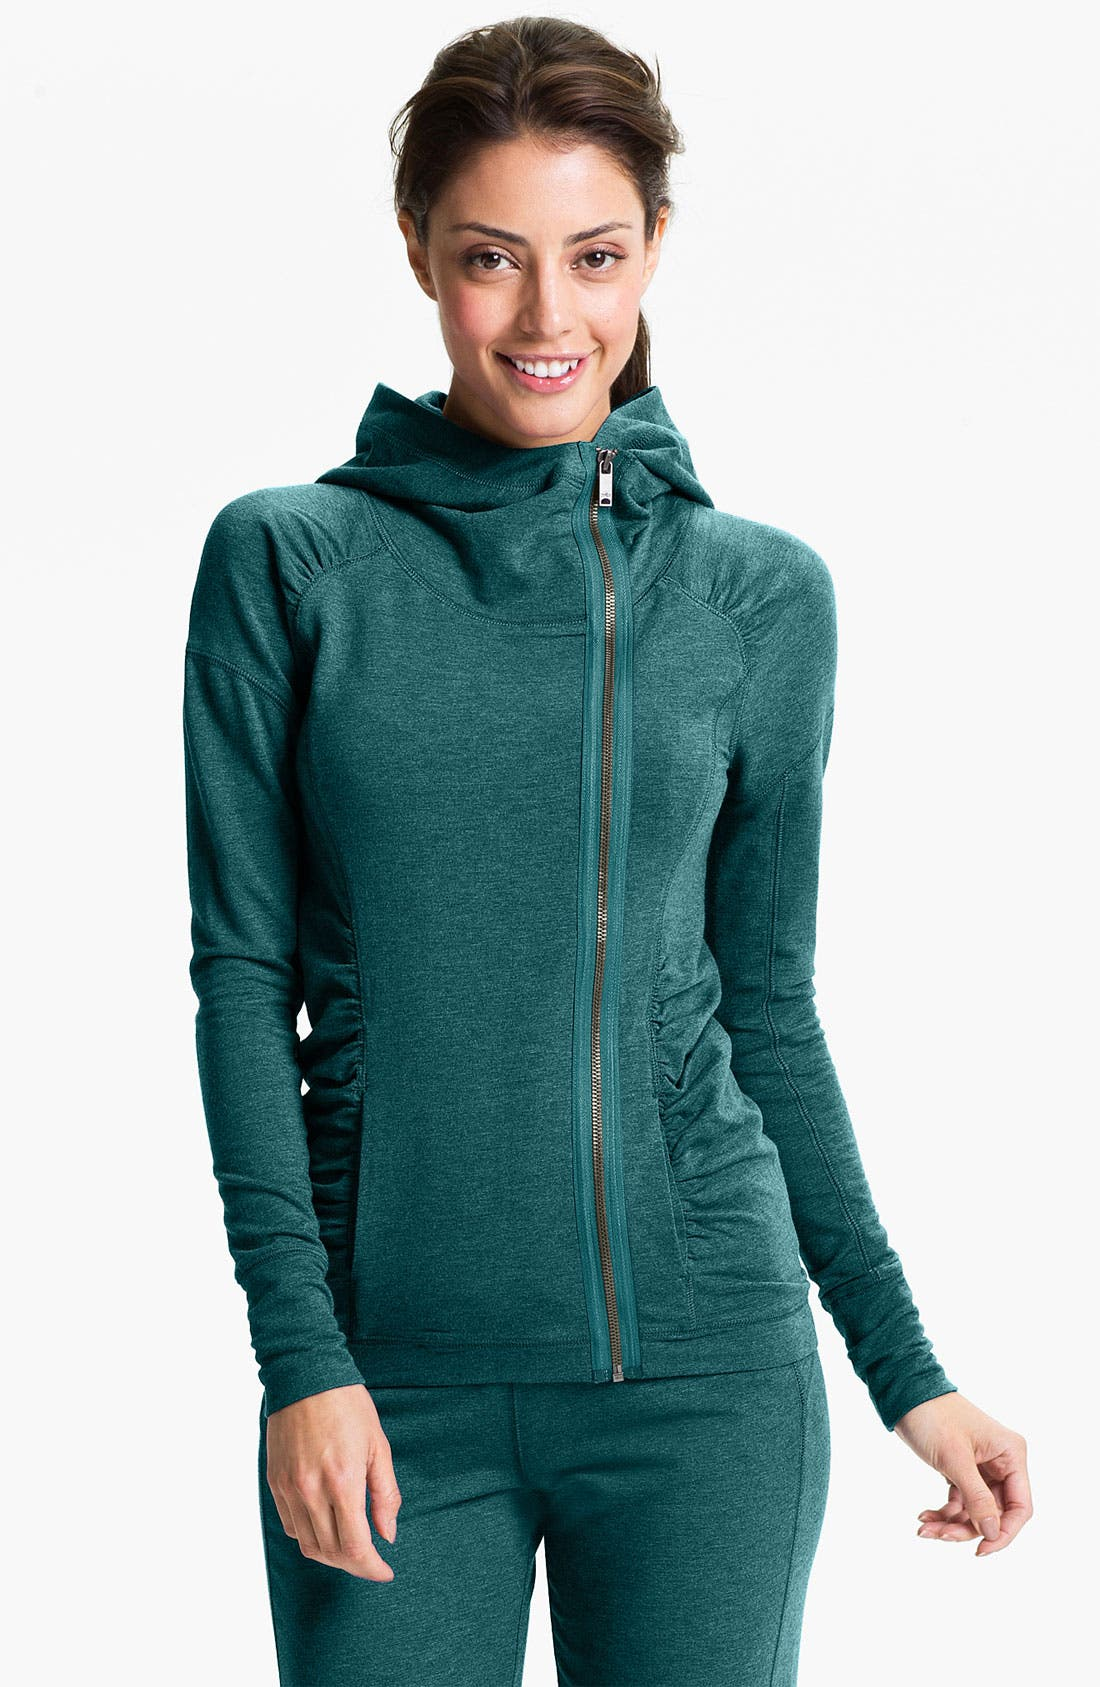 Alternate Image 1 Selected - Zella 'Fireside' Zip Front Jacket